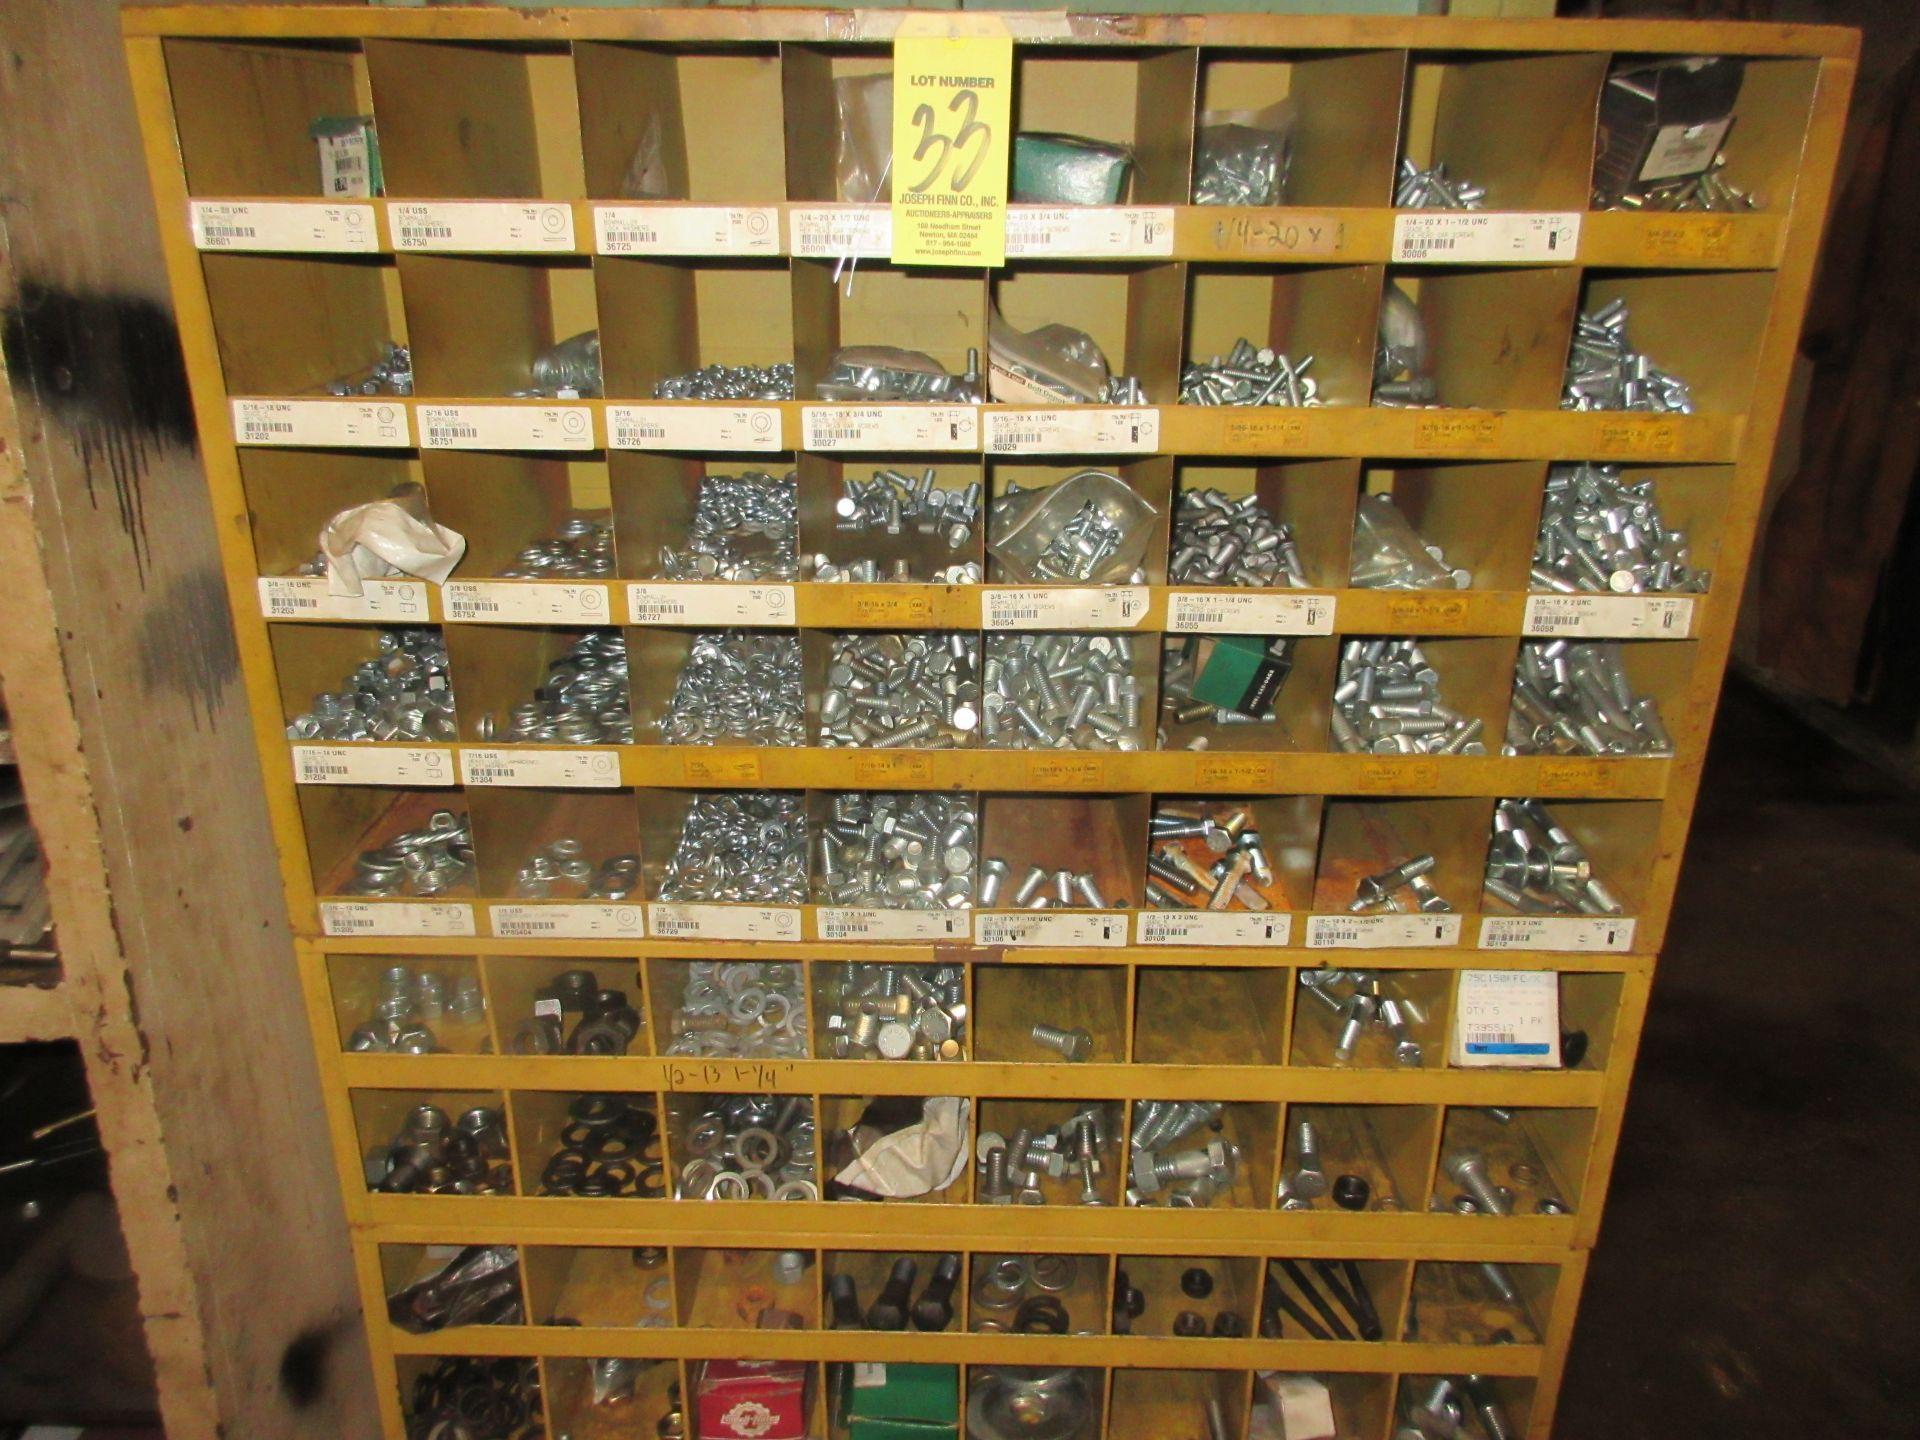 LOT (2) 40 Pocket Pigeon Hole Hardware Cabinets w/ Hardware